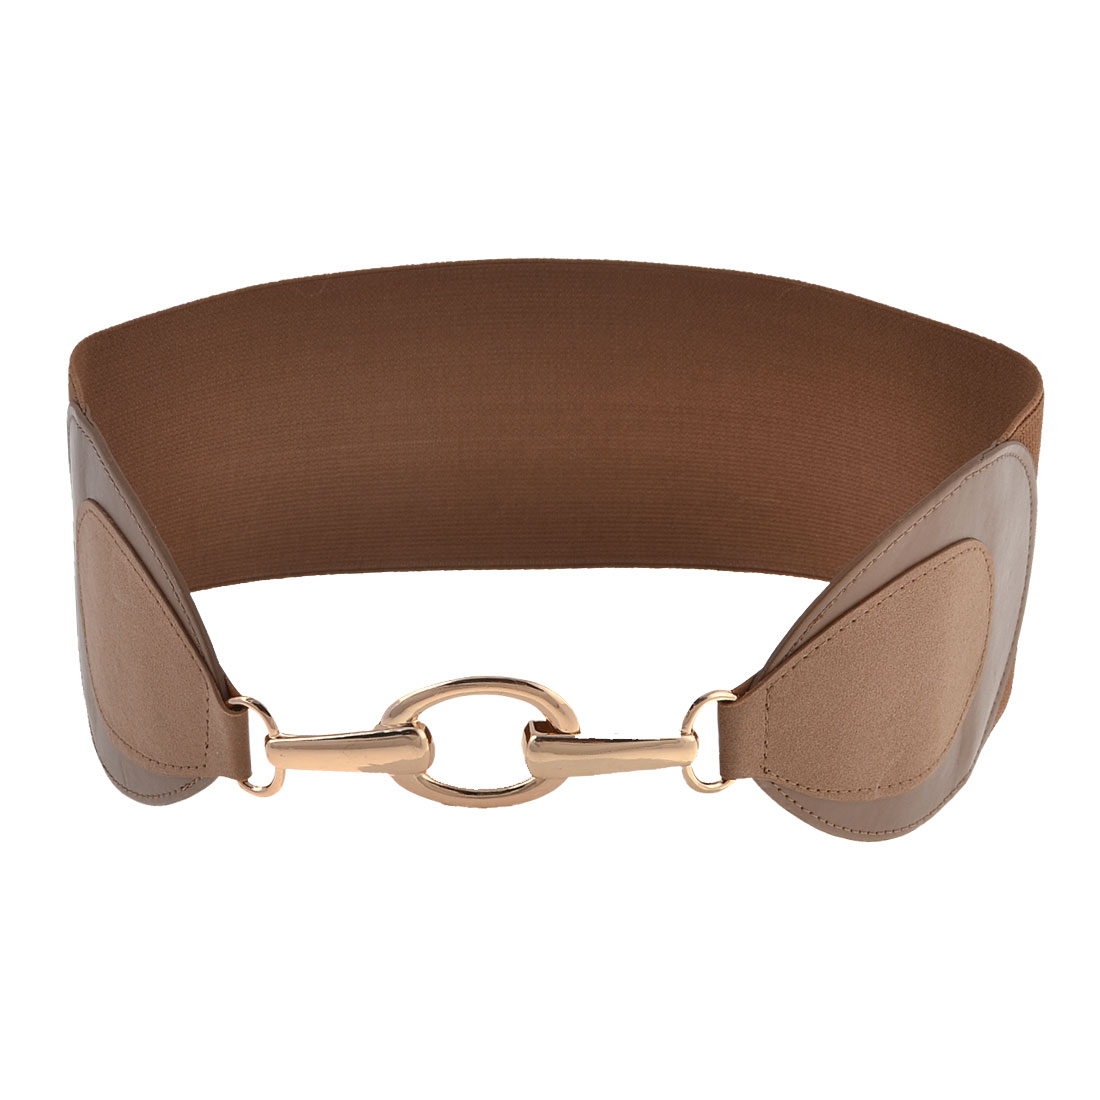 Woman Gold Tone Chain Hook Closure Brown Stretchy Band Cinch Belt Dress Decor